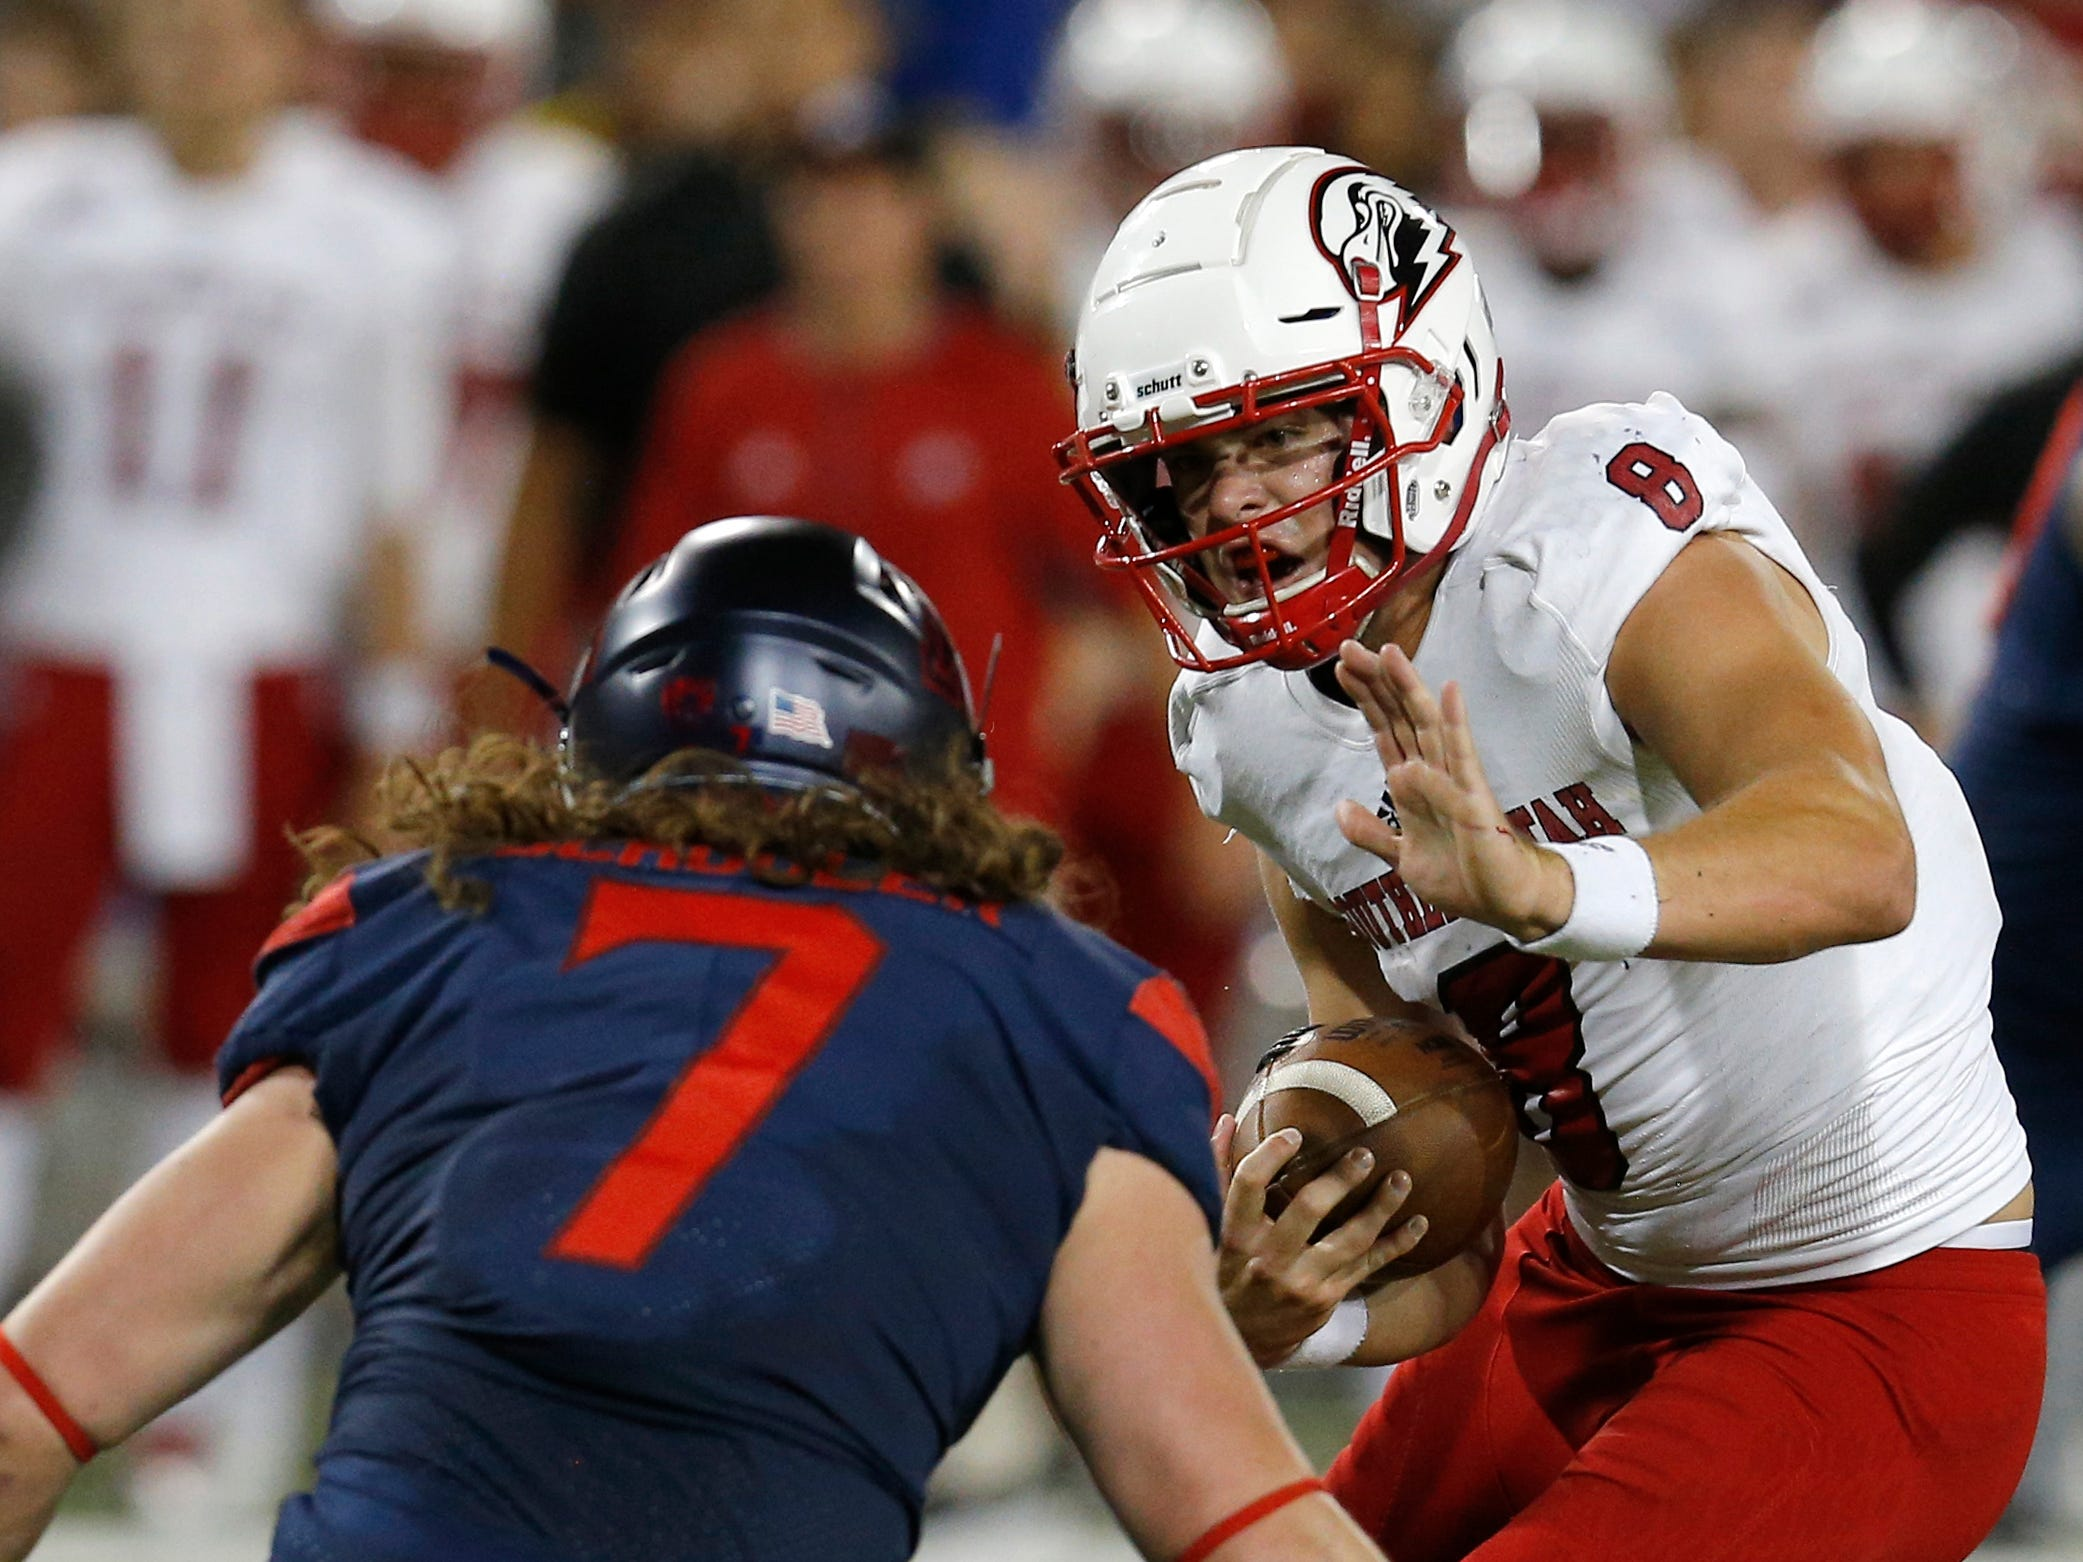 Southern Utah quarterback Chris Helbig (8) stiff-arms Arizona linebacker Colin Schooler in the first half during an NCAA college football game, Saturday, Sept. 15, 2018, in Tucson, Ariz. (AP Photo/Rick Scuteri)